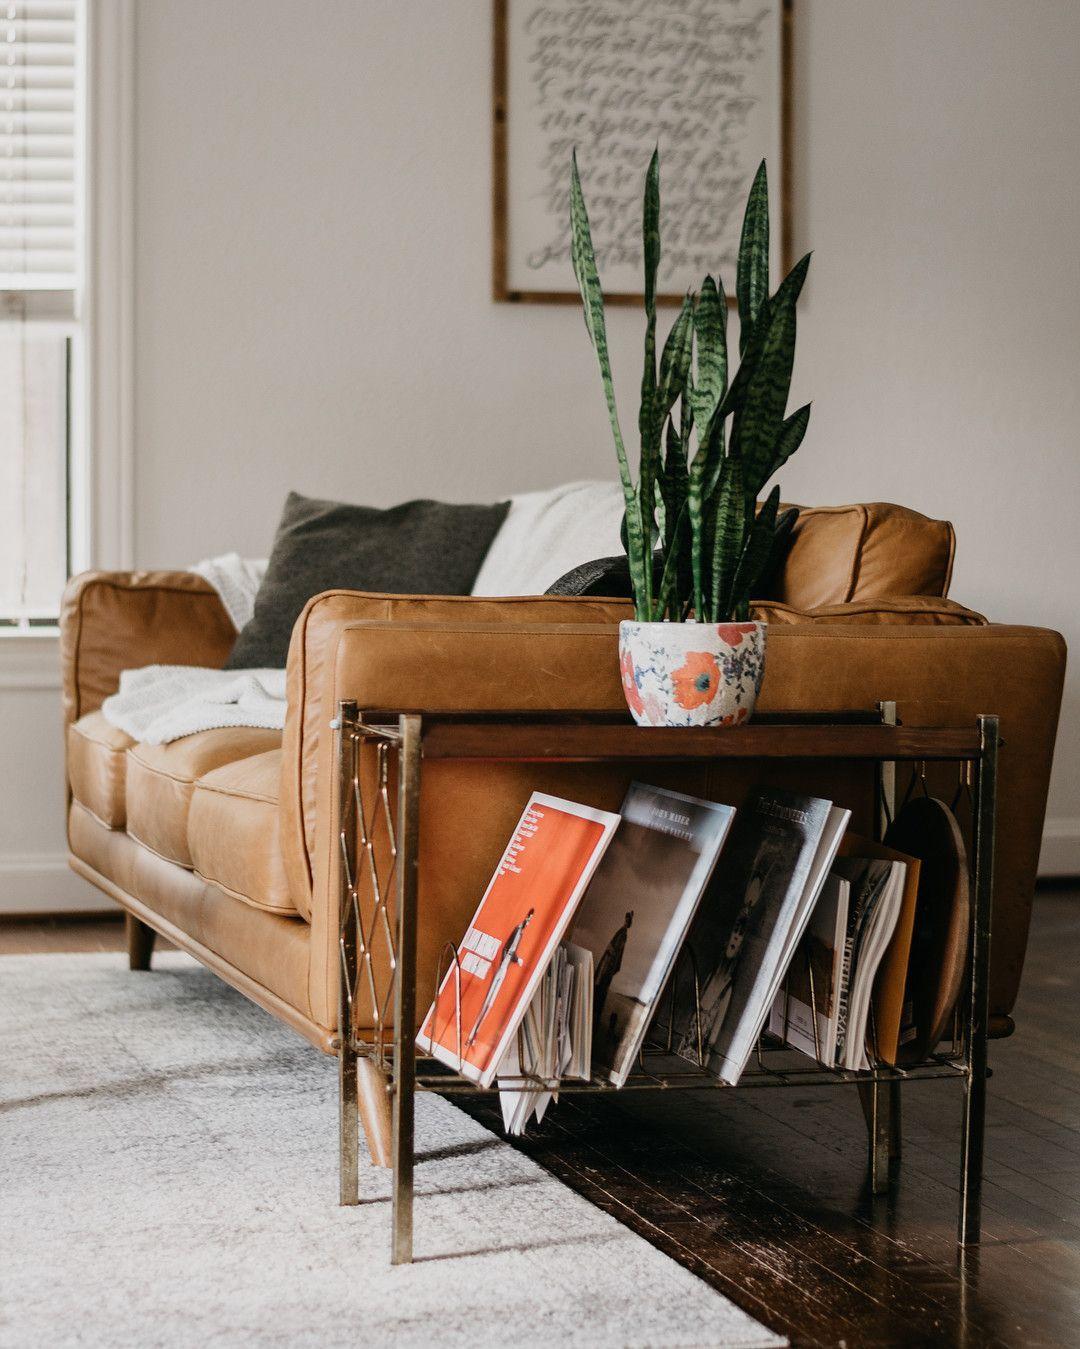 Timber Charme Tan Sofa Sofas Article Modern Mid Century And Scandinavian Furniture Apartment Furniture Dream Living Rooms Living Room Furniture #tan #sofa #living #room